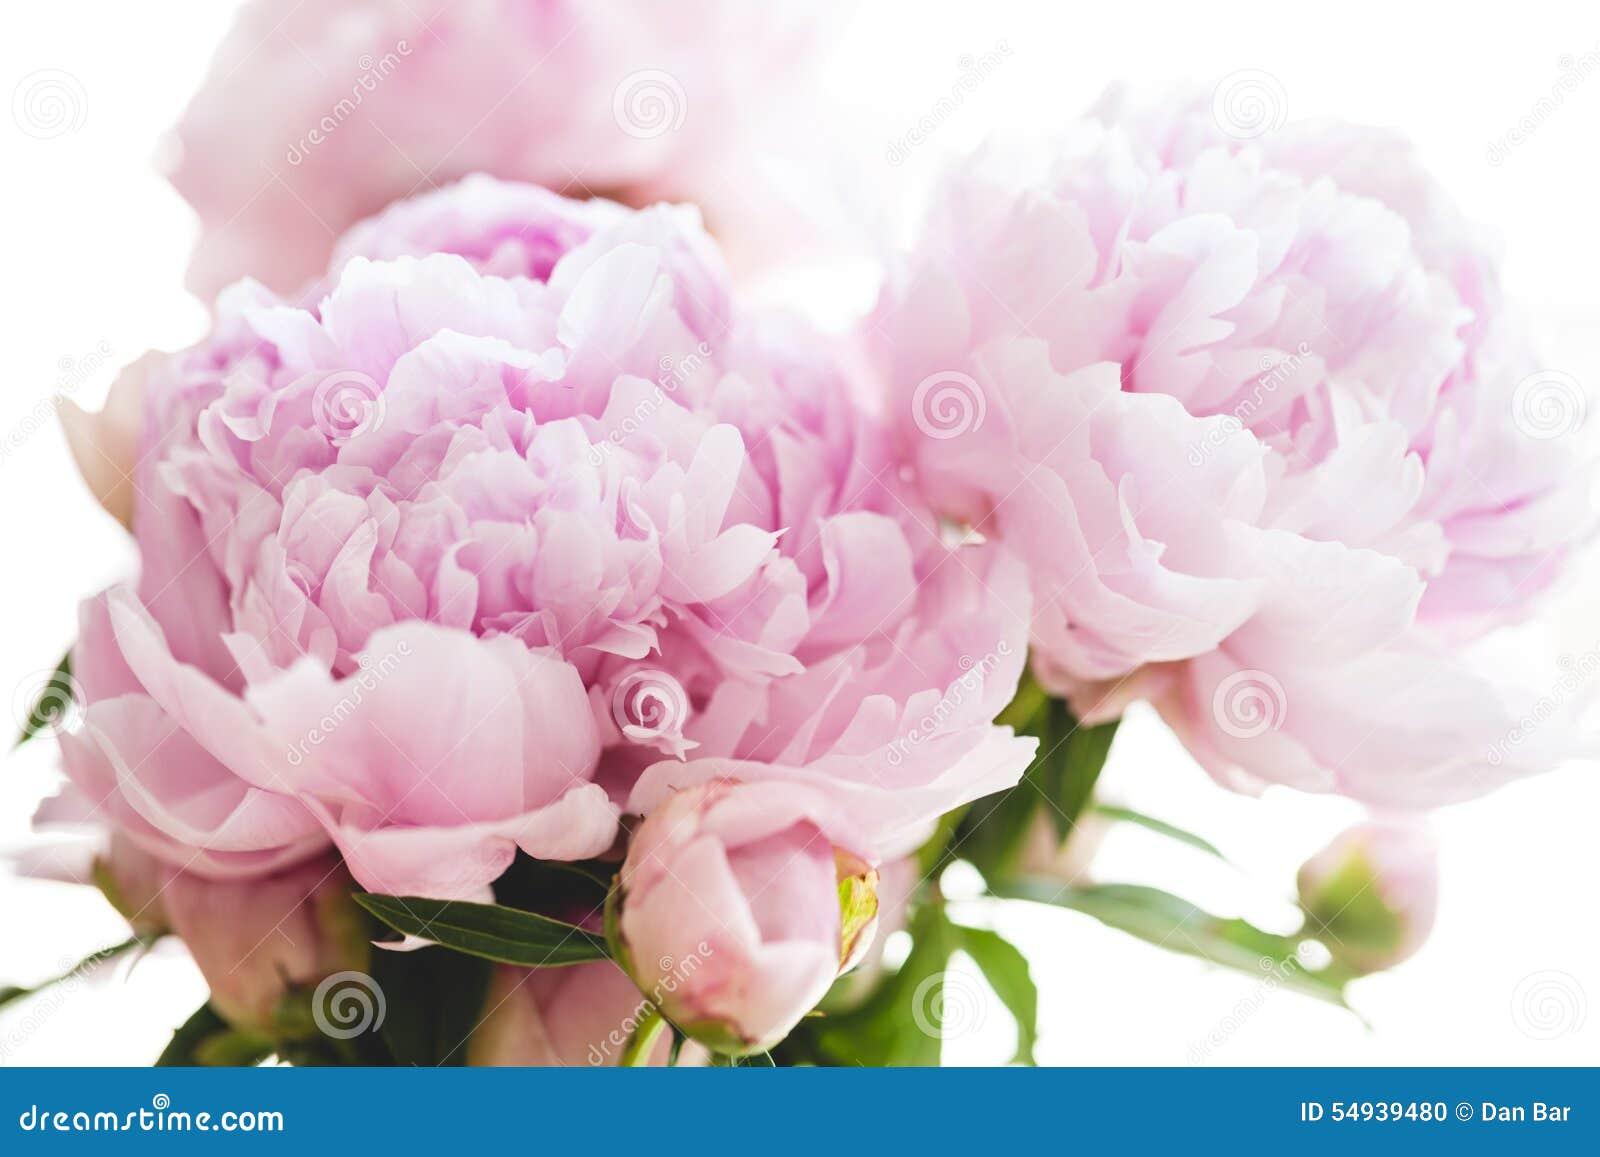 Beautiful pink peony flowers stock photo image 54939480 background beautiful flowers peony pink dhlflorist Images